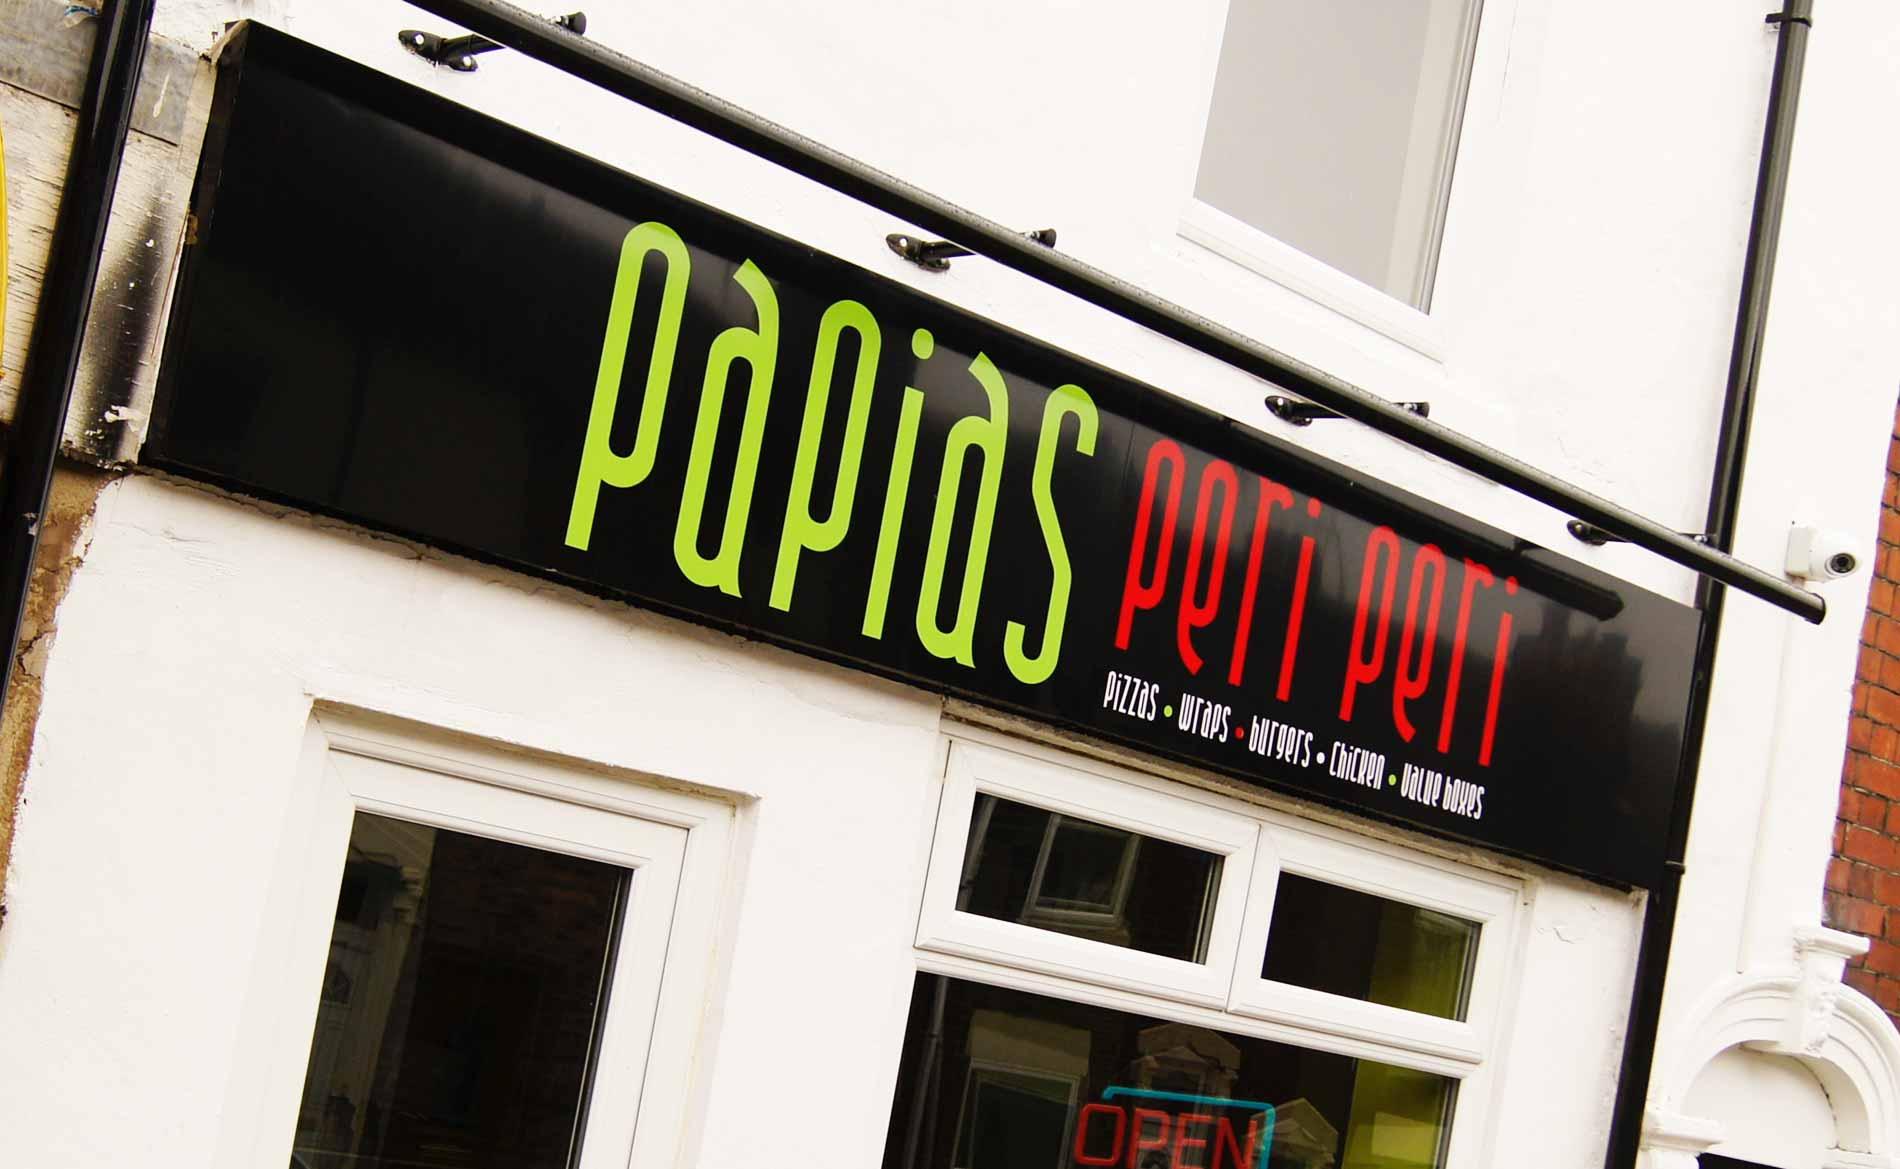 Signage, Papias Takeaway, Fascia Shop Signage, Stoke-on-Trent, Staffordshire